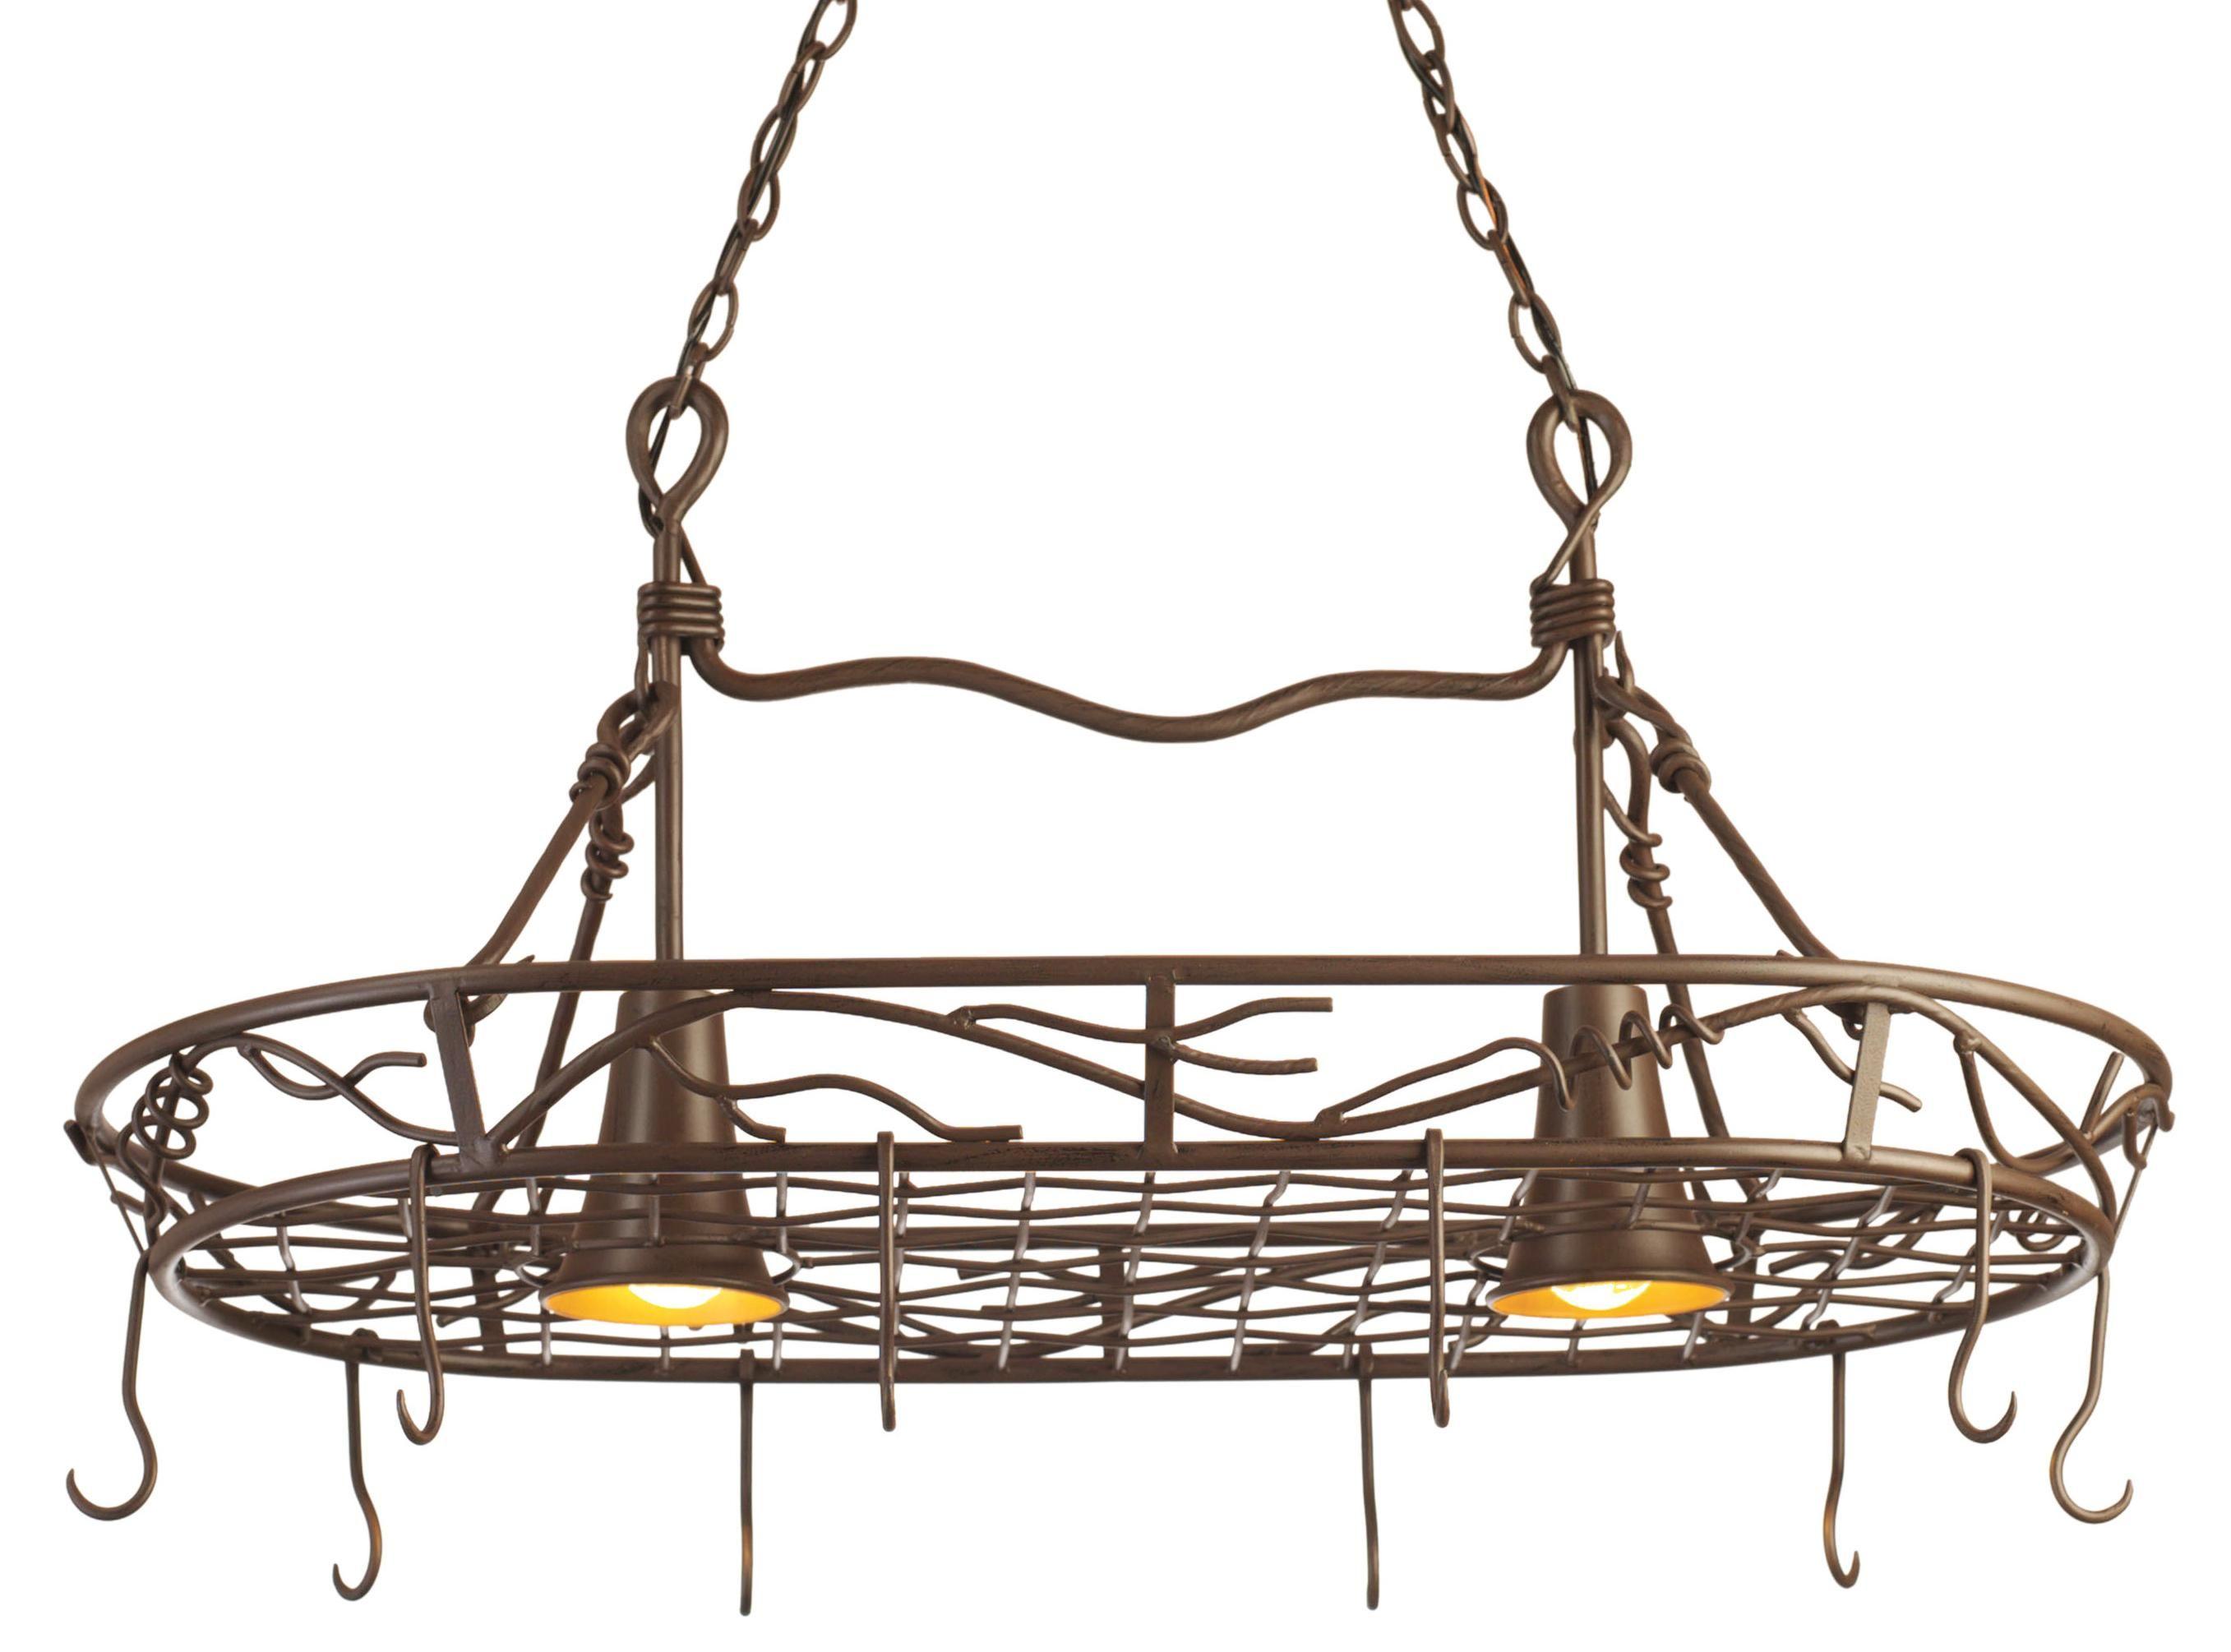 lighting | Pot rack, Pot rack hanging, Hanging lights